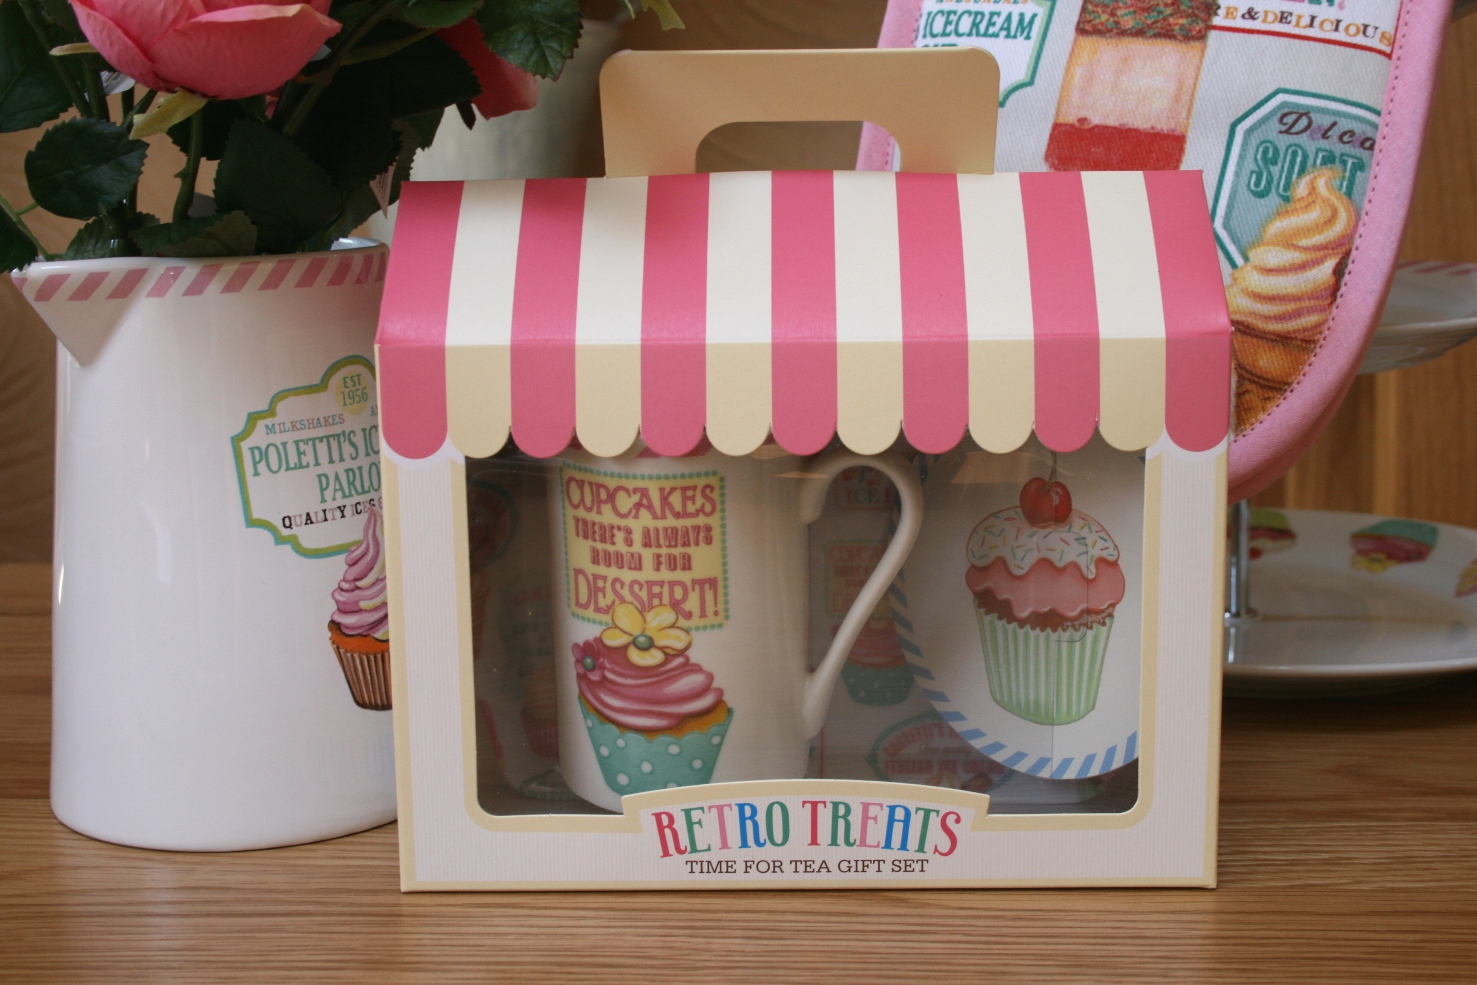 Tea Gift Set - CRT-5130522 - €12.50